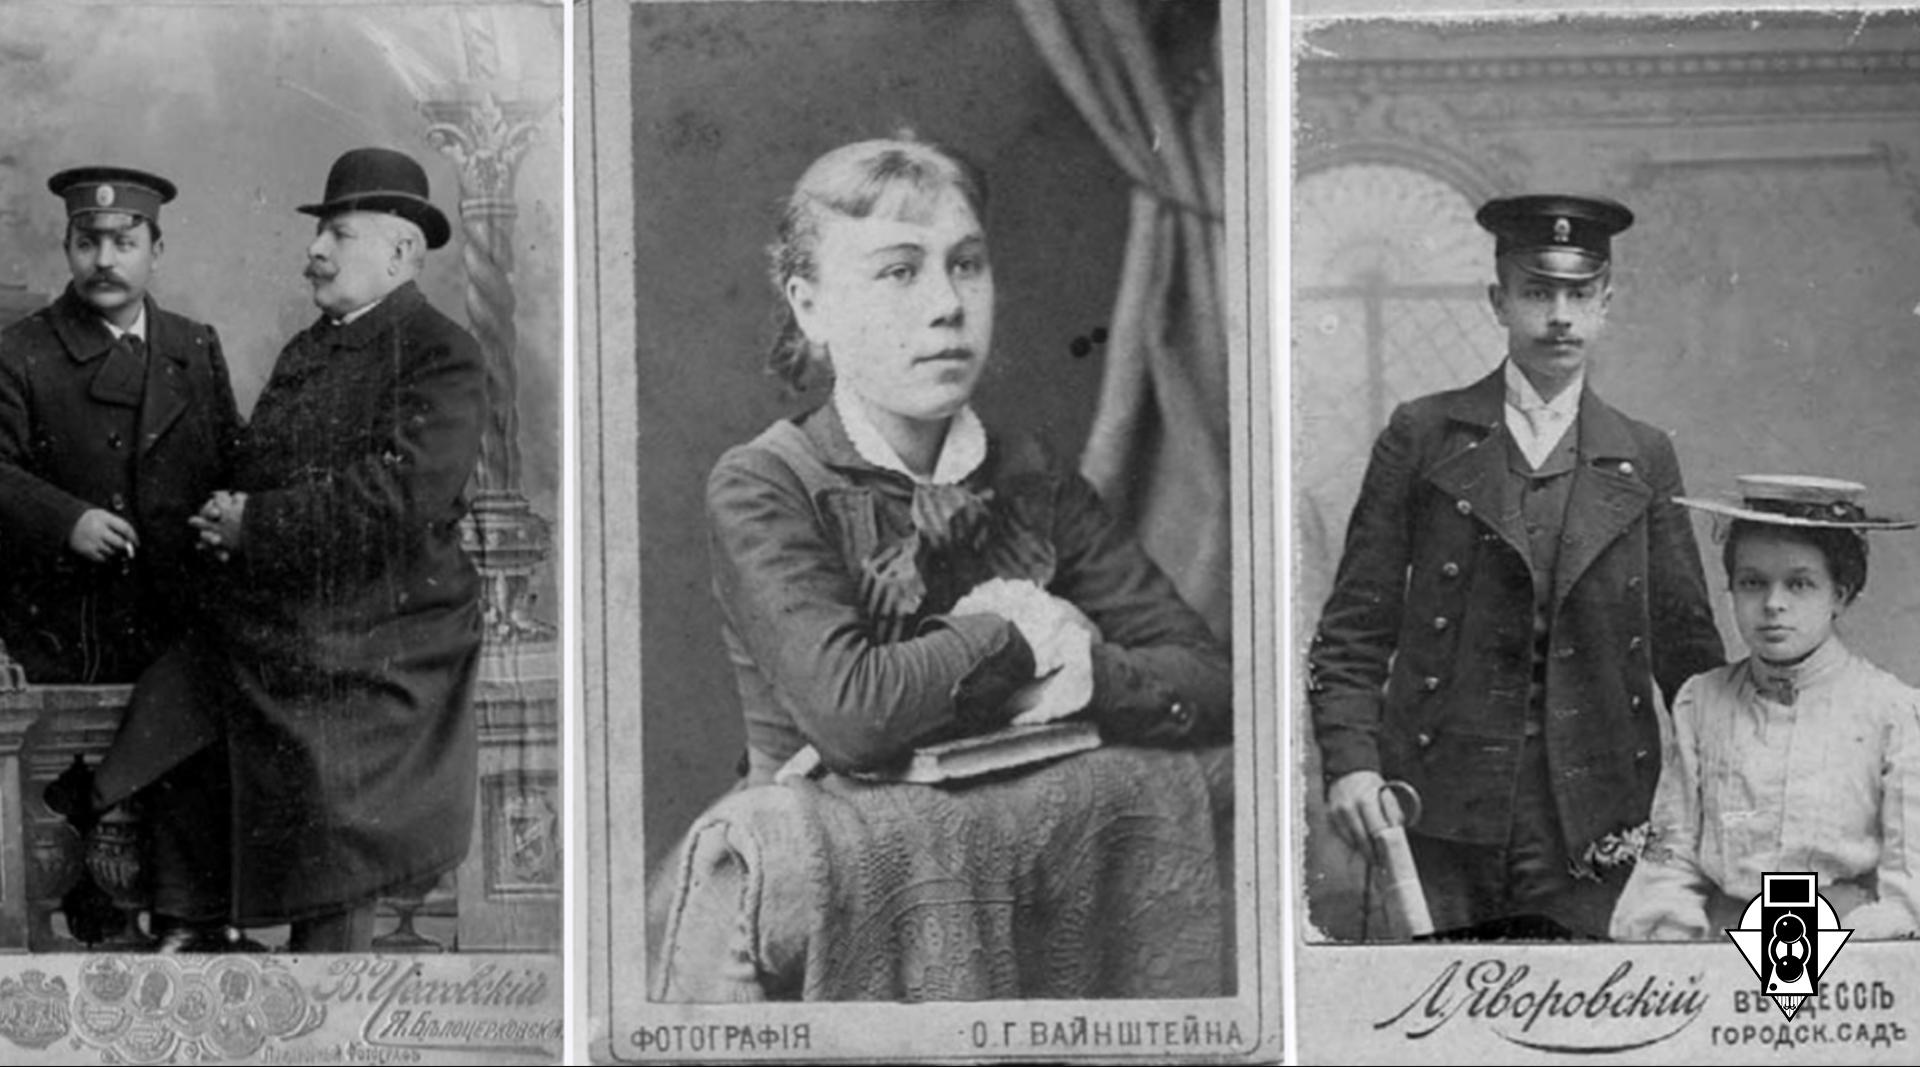 Фотографы-любители. Вестник ОФО за август 1912 г.